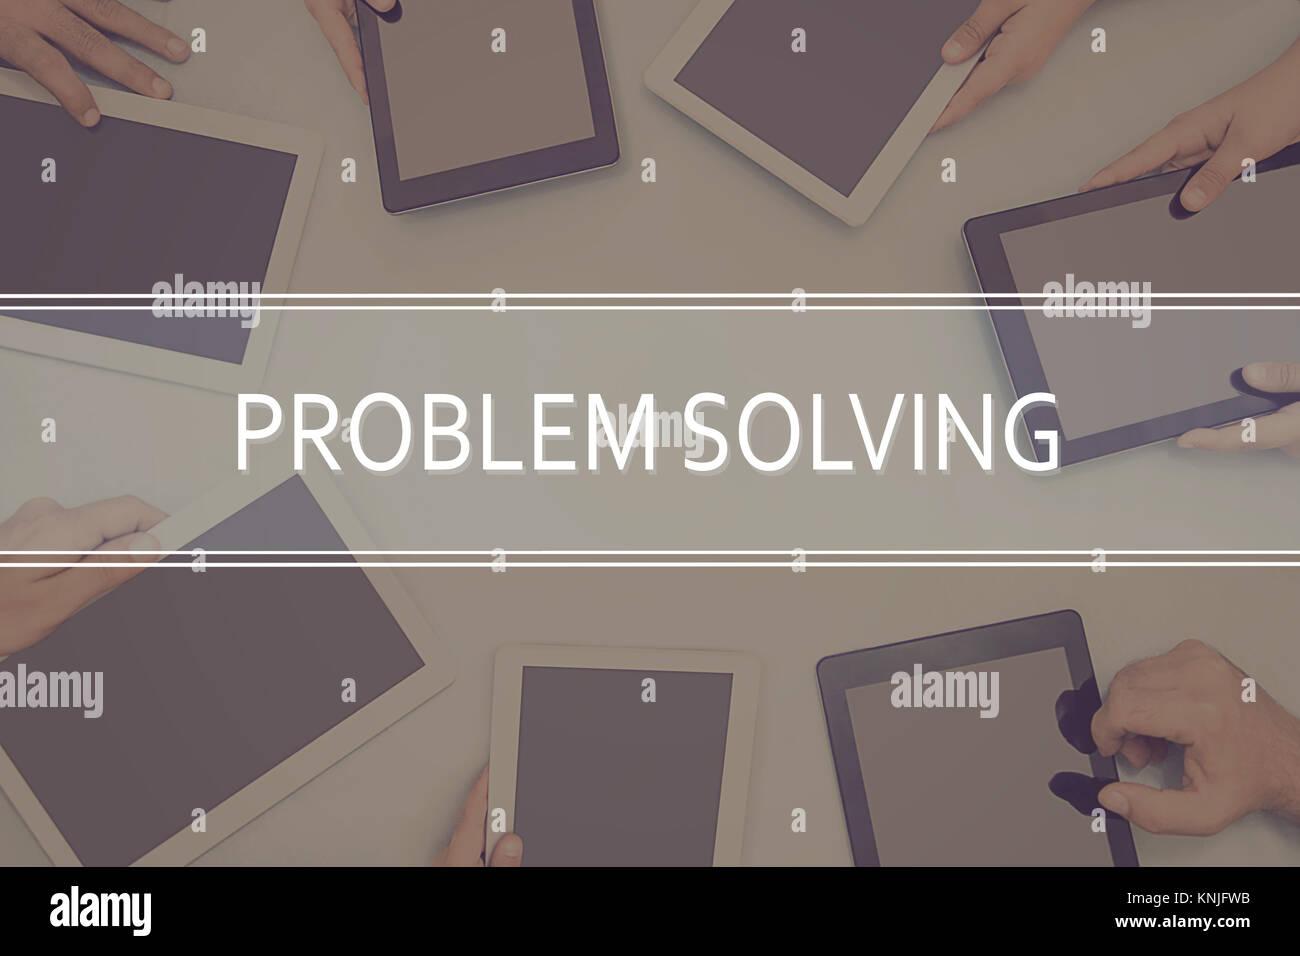 PROBLEM SOLVING CONCEPT Business Concept. - Stock Image